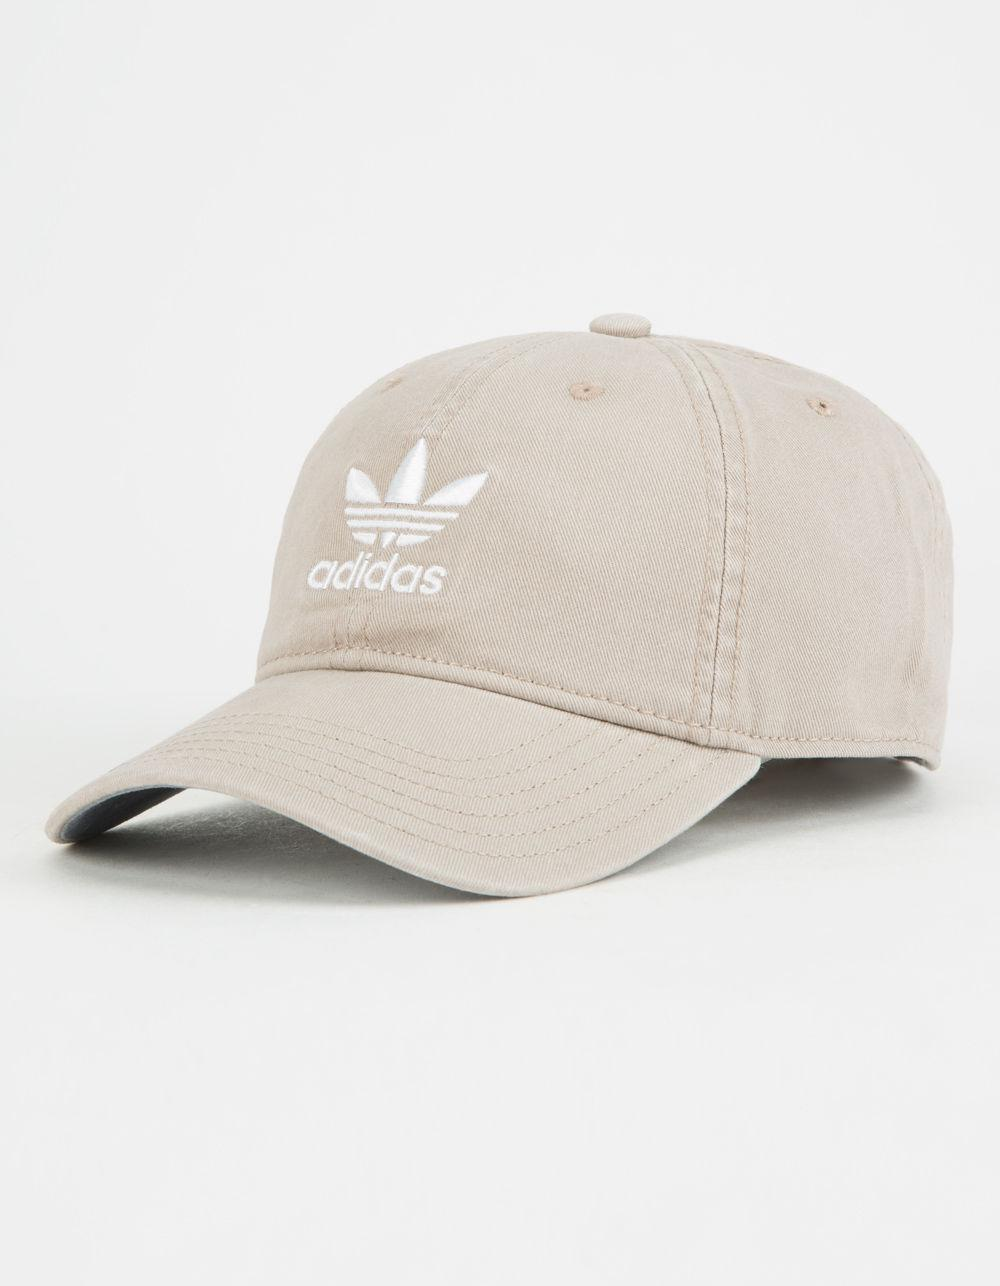 Lyst - adidas Originals Relaxed Khaki Mens Dad Hat in Natural for Men 554766cf7dd